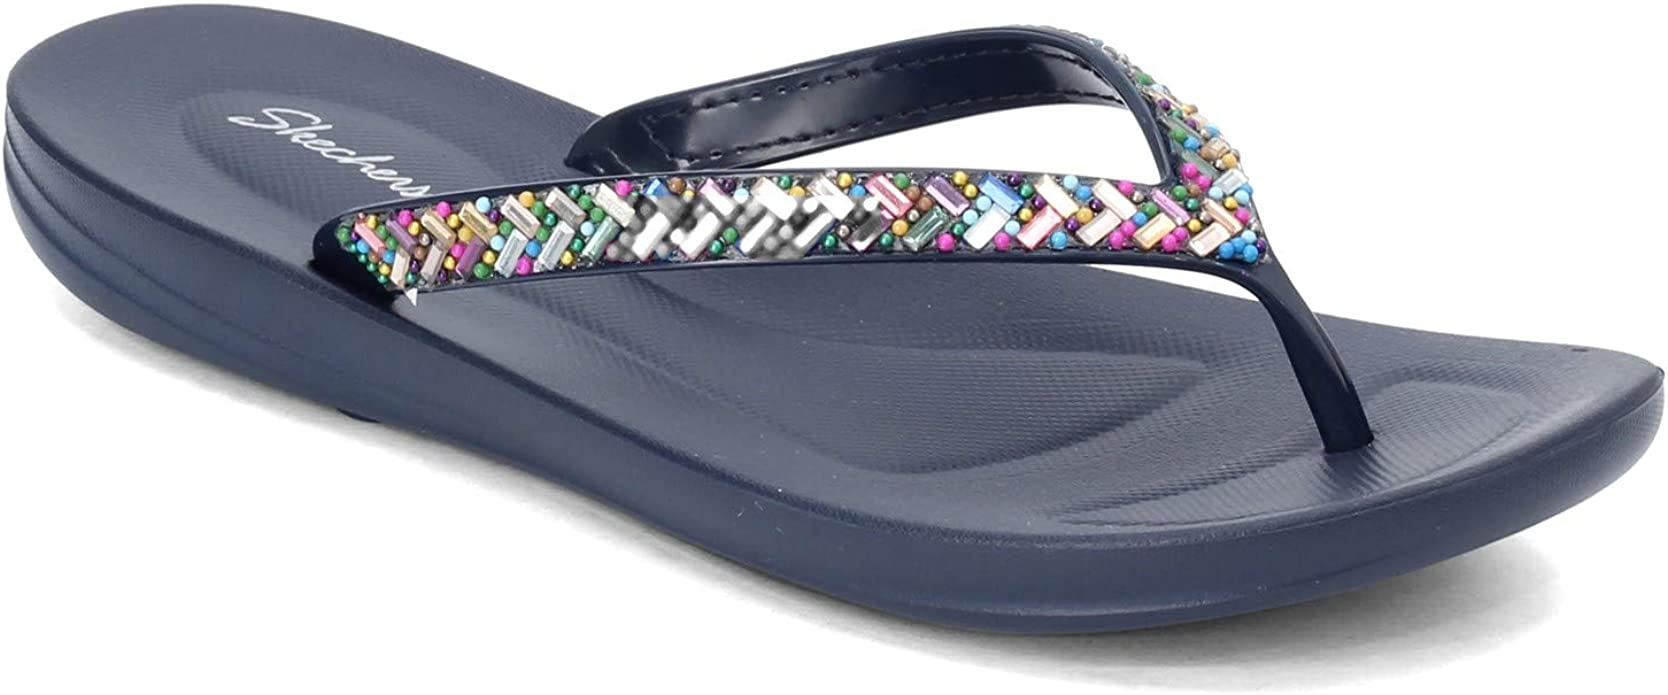 Skechers Womens Bungalow - Brunch Date - Multi-Colored Rhinestone Jelly Thong Flip-Flop